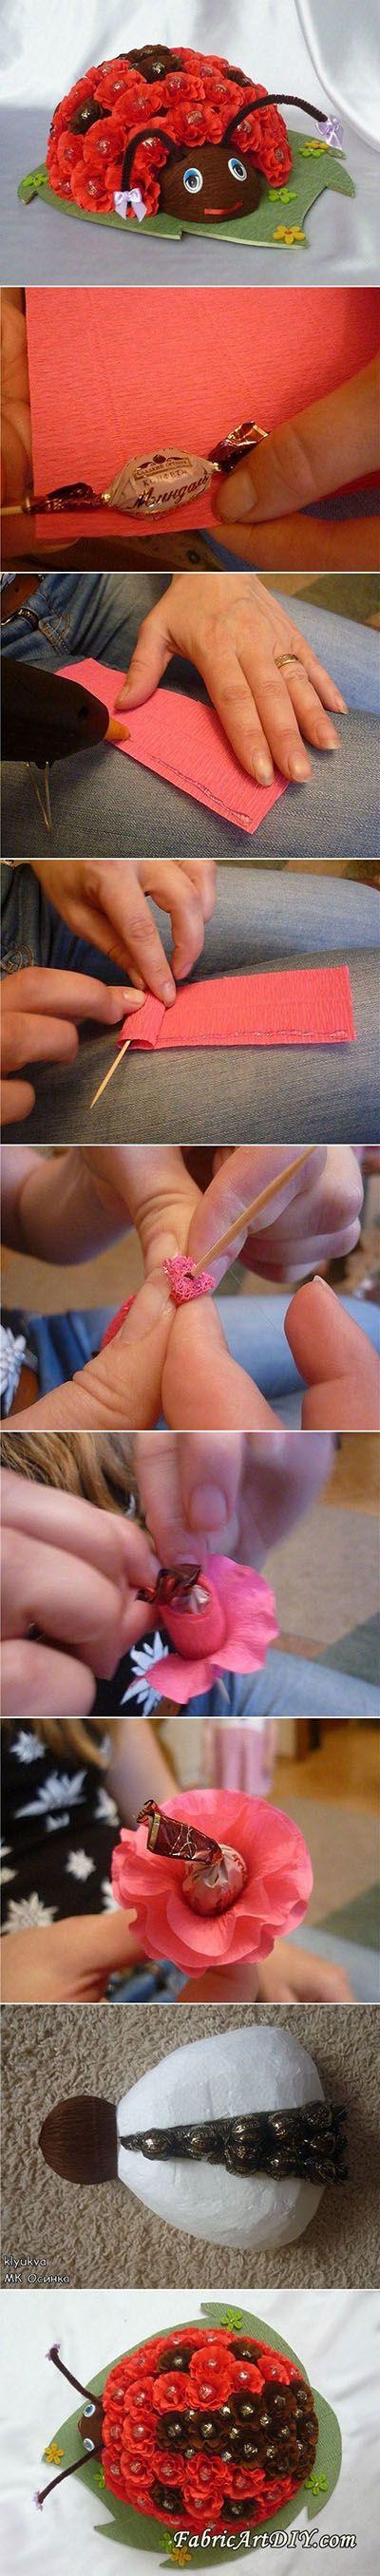 How to Make Chocolate Floral Ladybug Bouquet | DIY & Crafts Tutorials